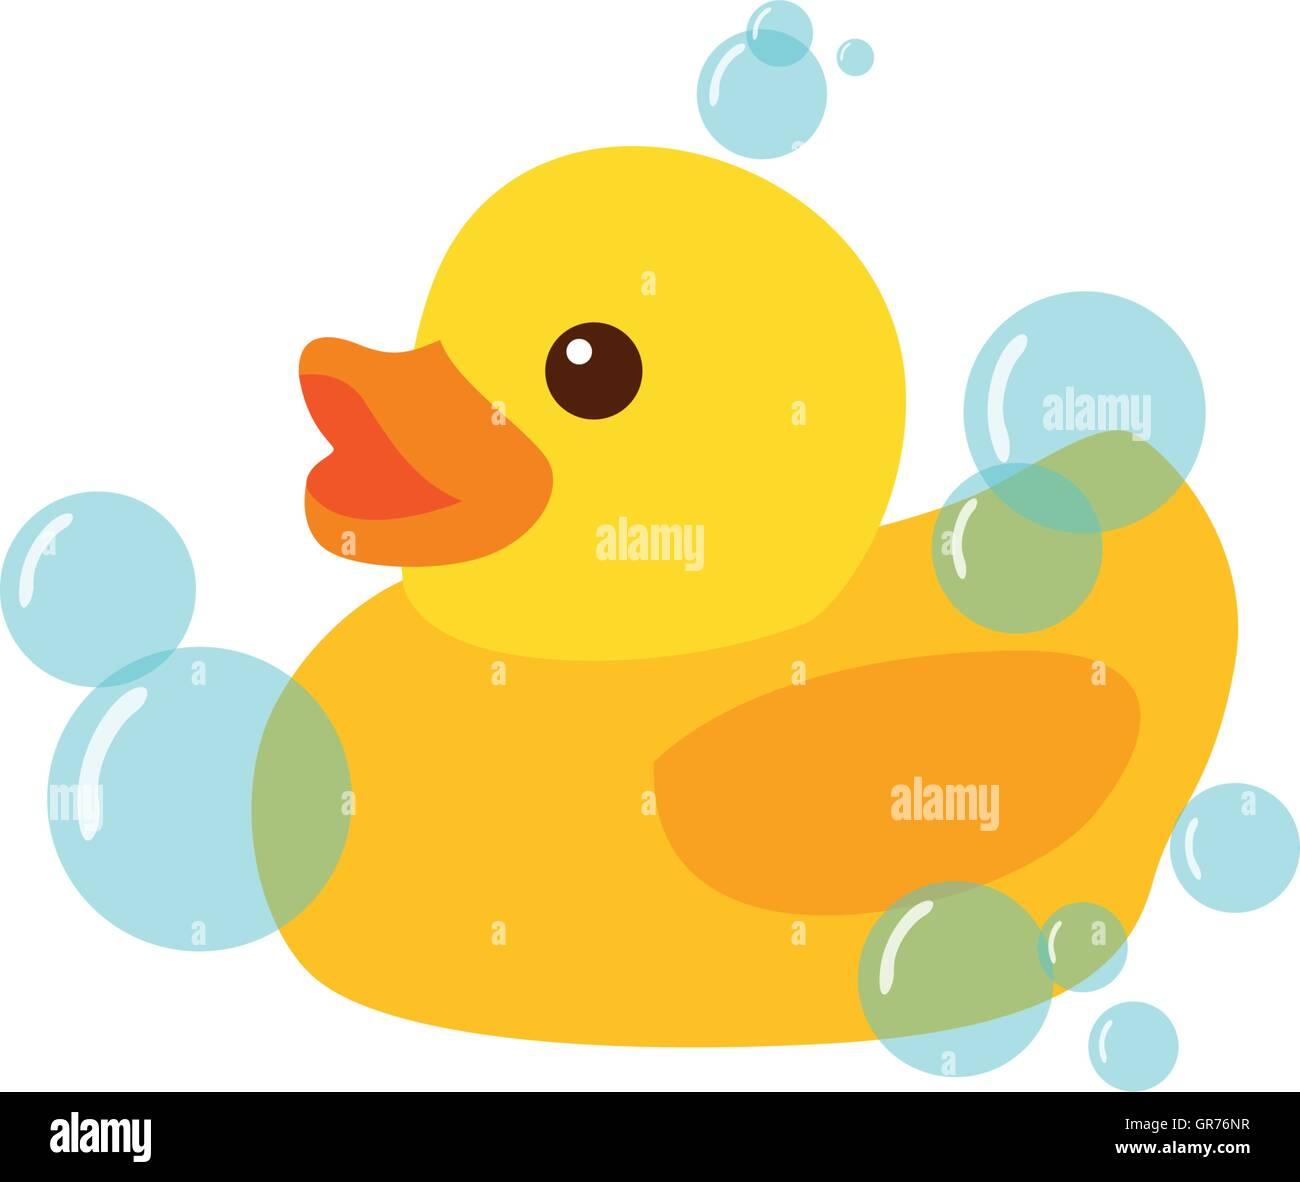 Yellow Rubber Duck Icon Vector Illustration Clipart Stock Vector ...